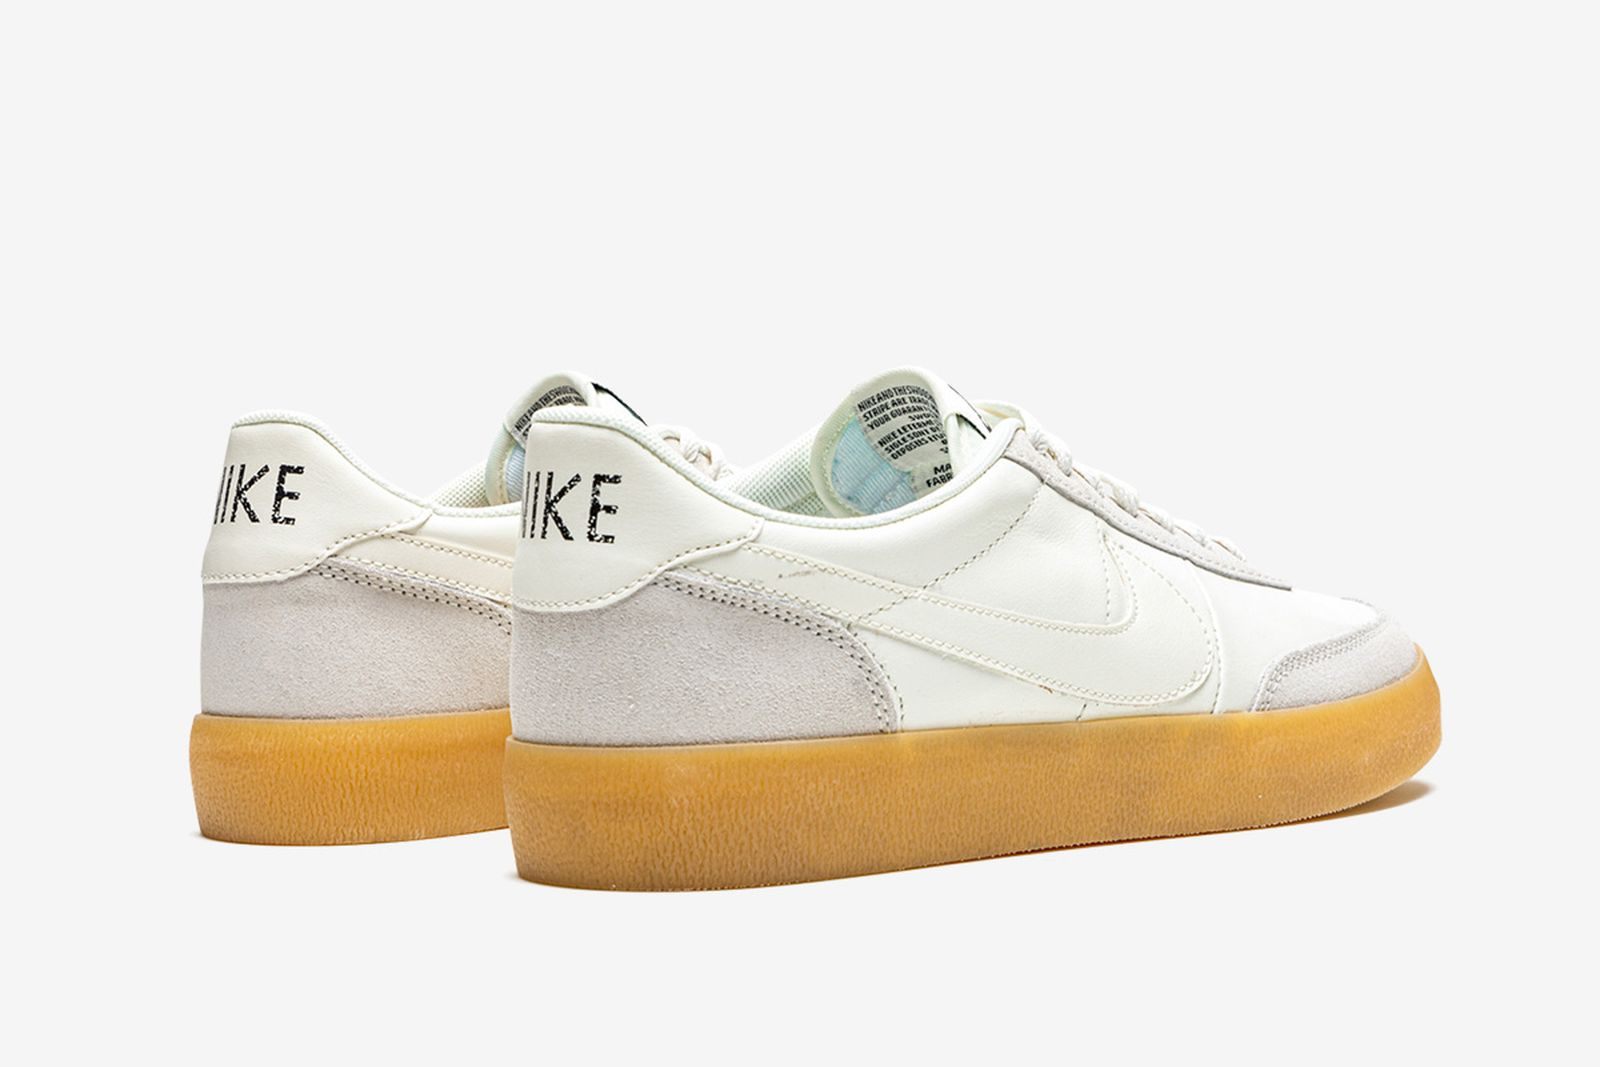 '70s sneakers